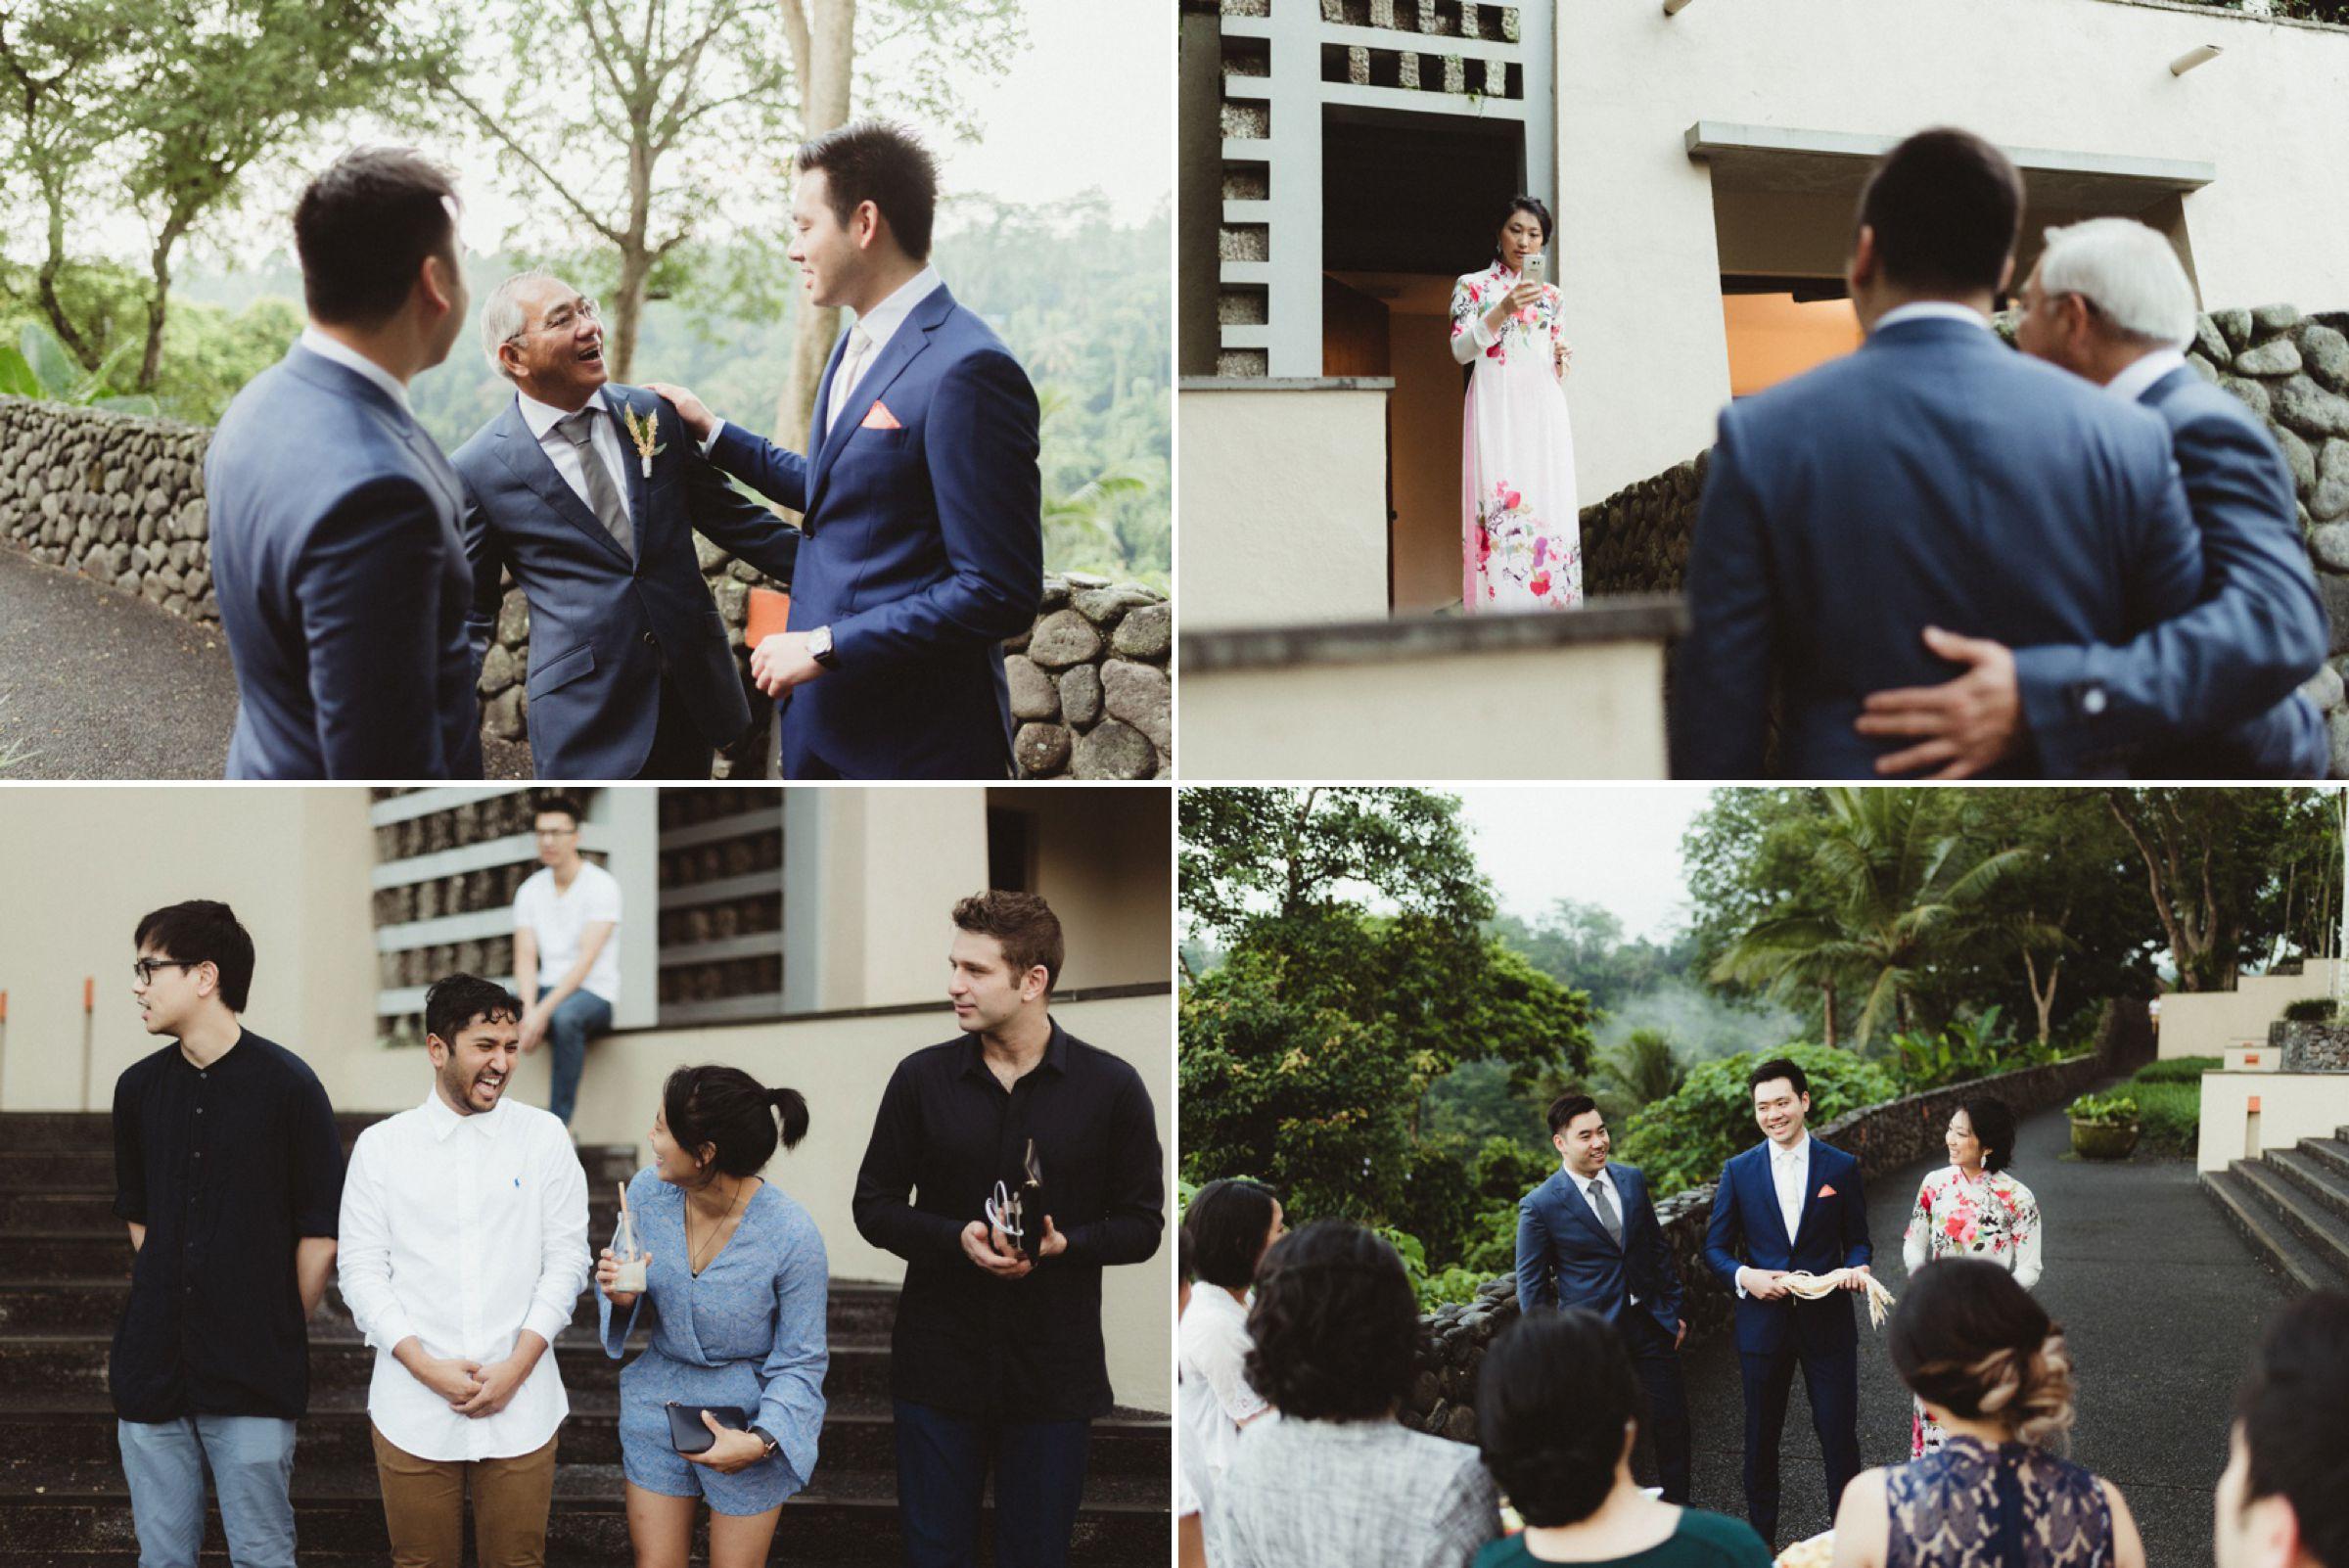 Tim-Danika-Bali-Wedding-Pyara-Photo-Evans 14.jpg